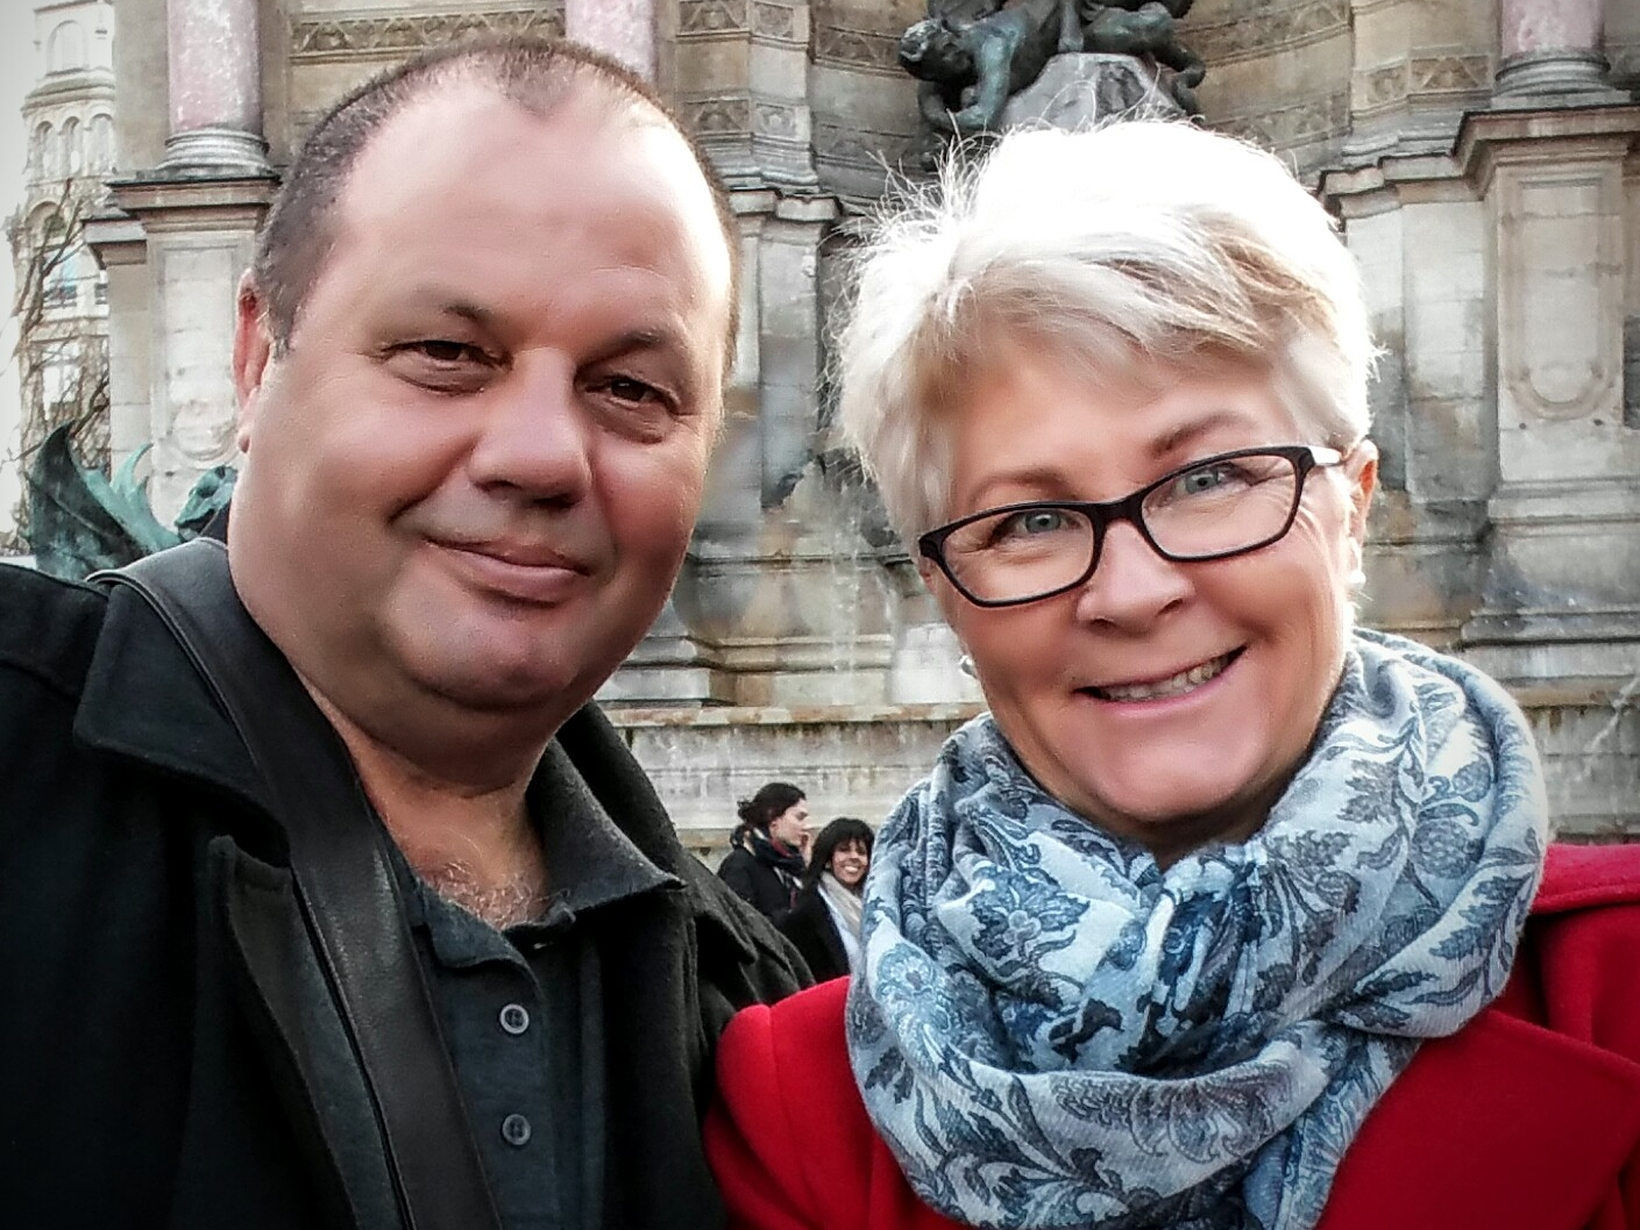 Paige & Rod from Perth, Western Australia, Australia